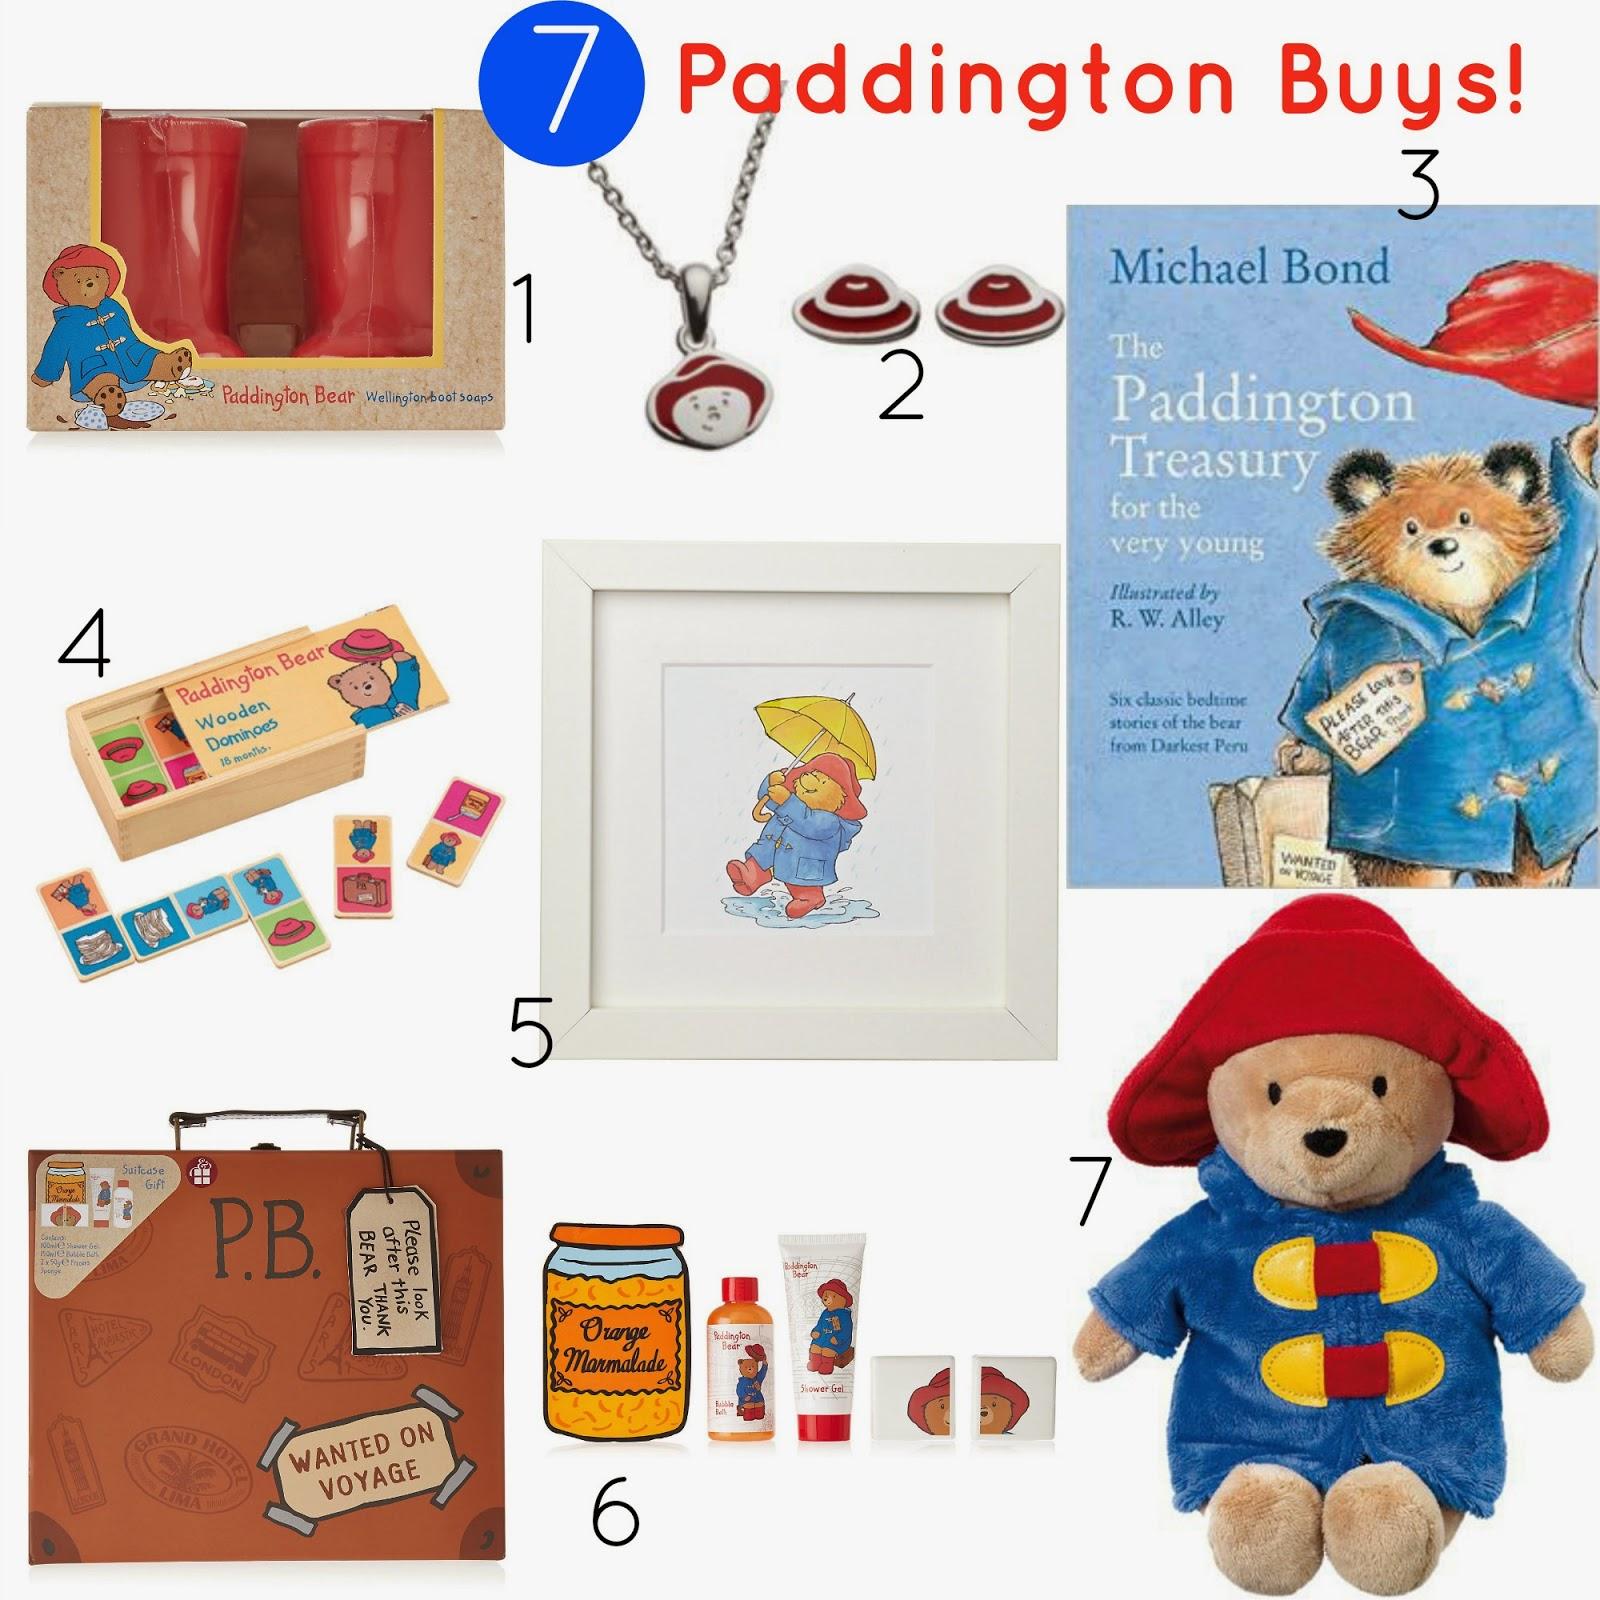 Get Ready For The Paddington Bear Take Over Mamas V I B